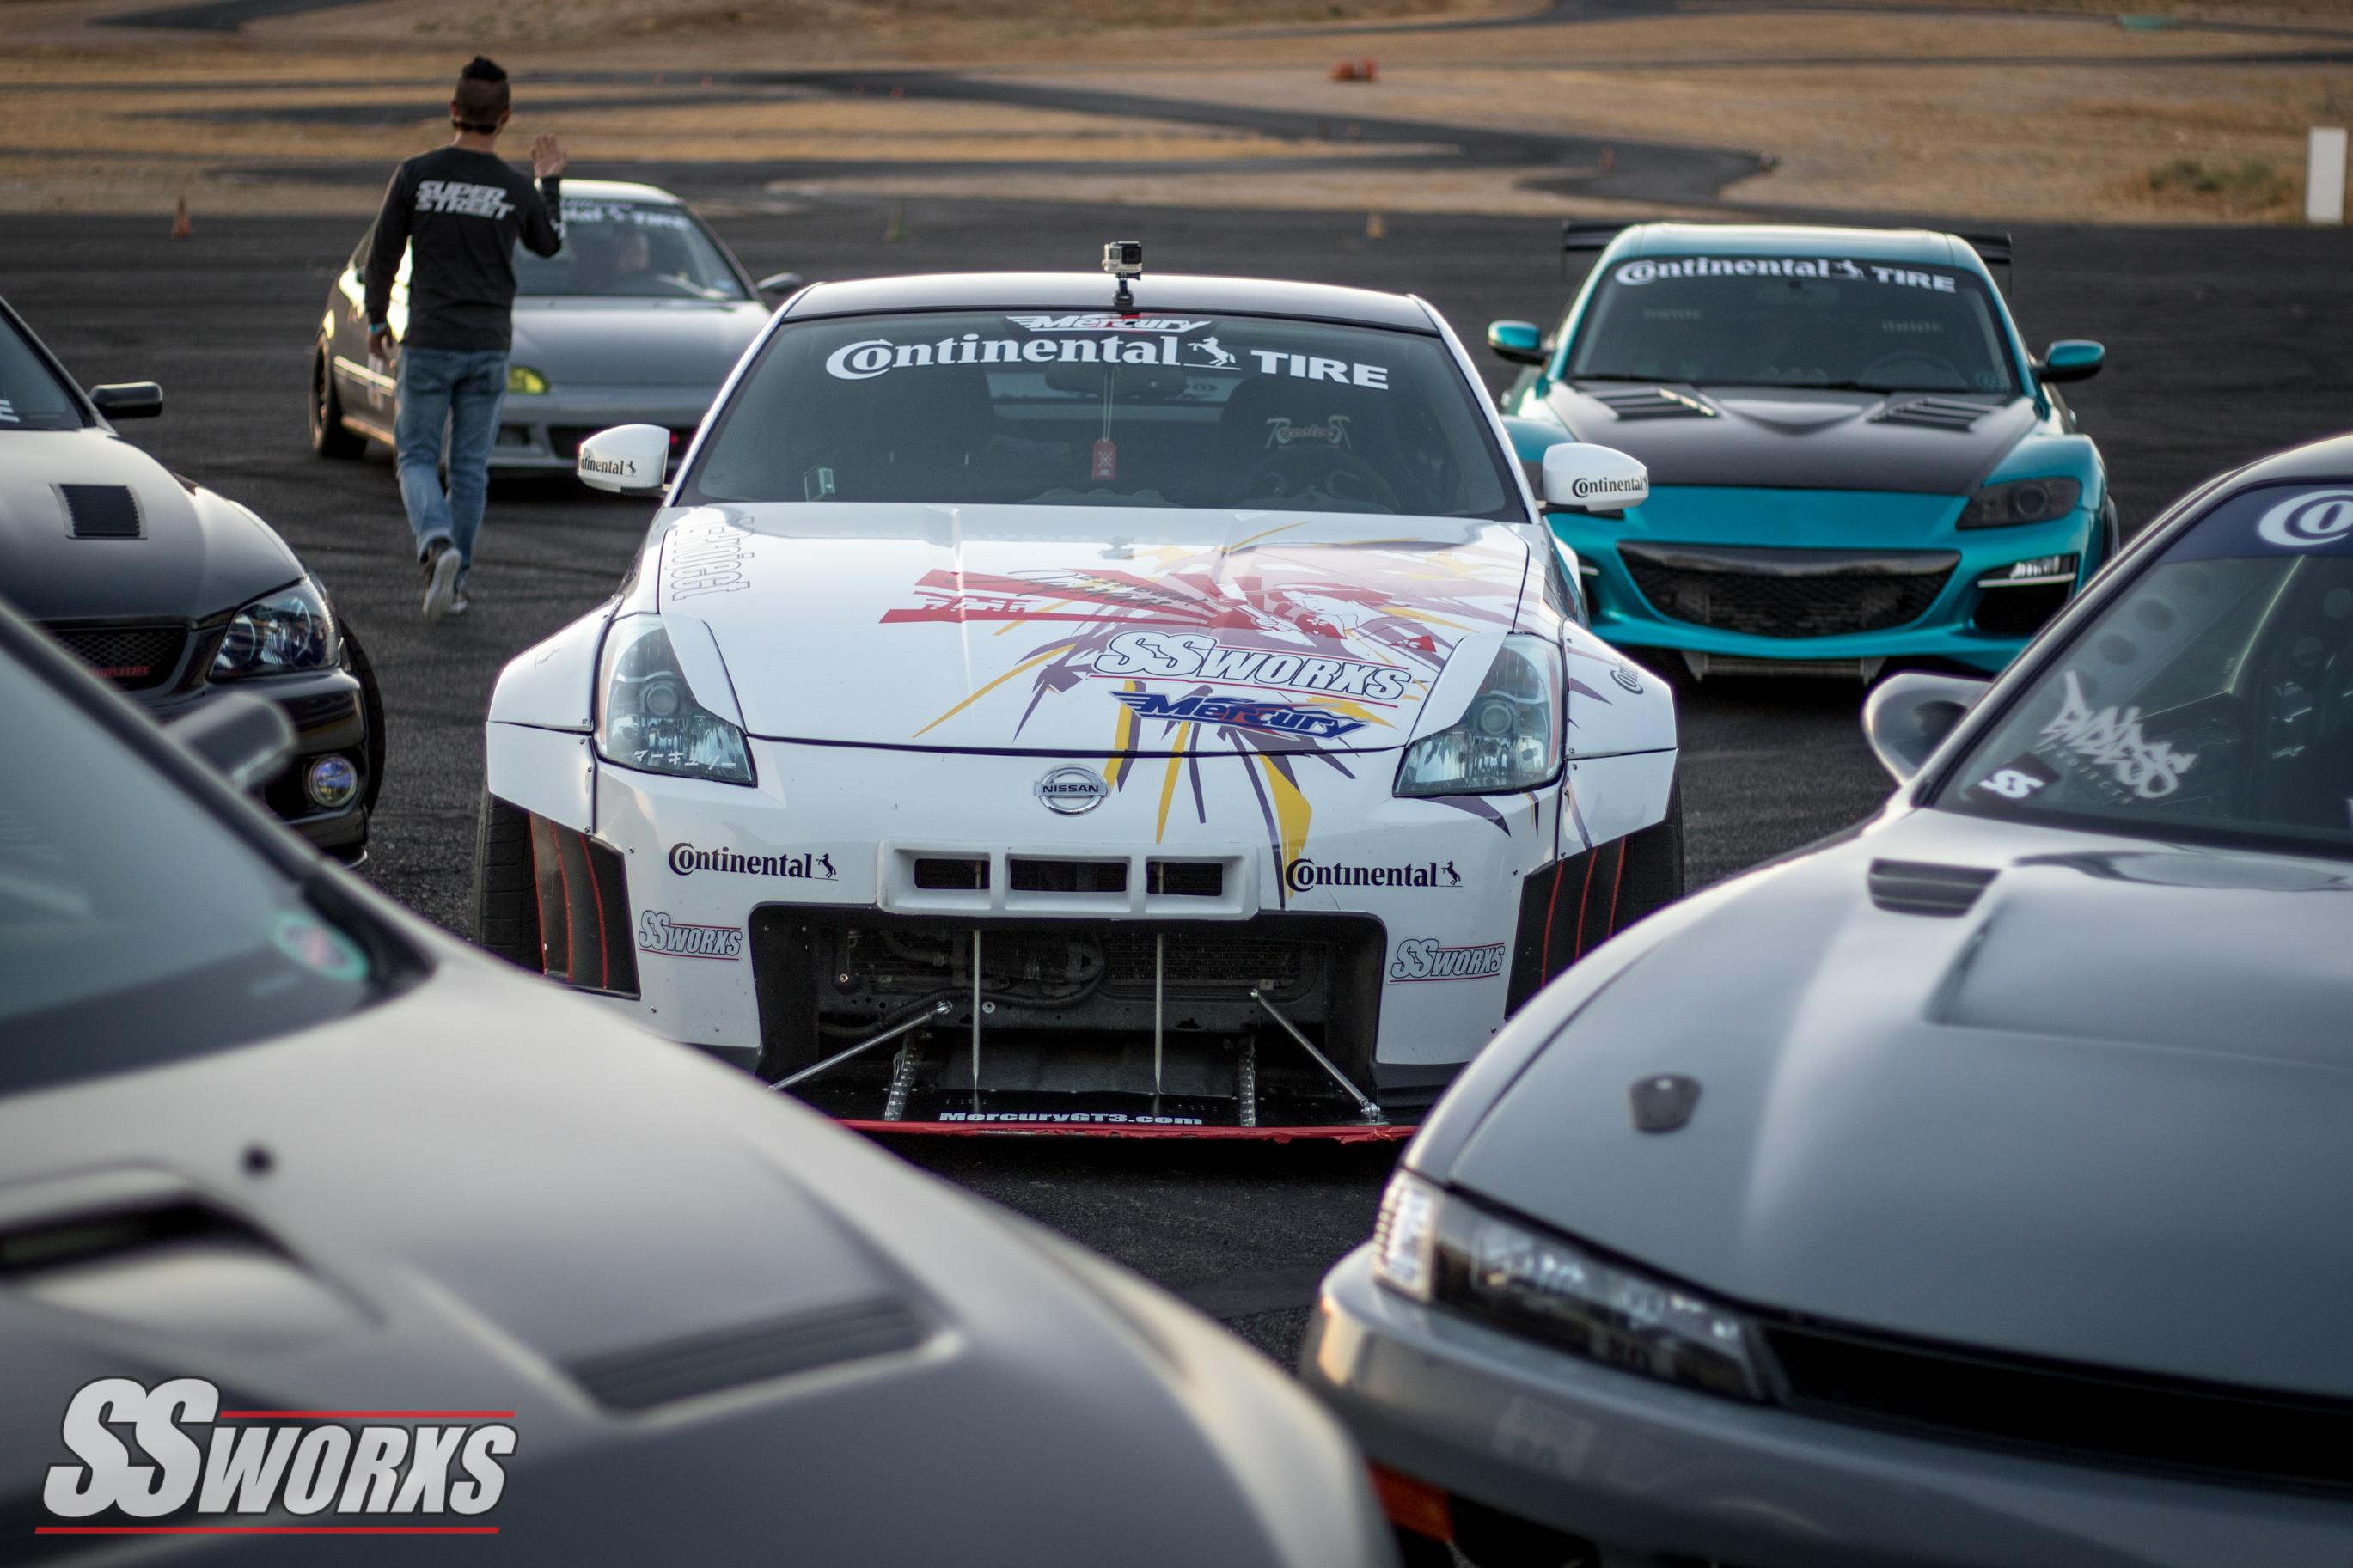 Super Street Continental Tire Show Car Shootout 2017